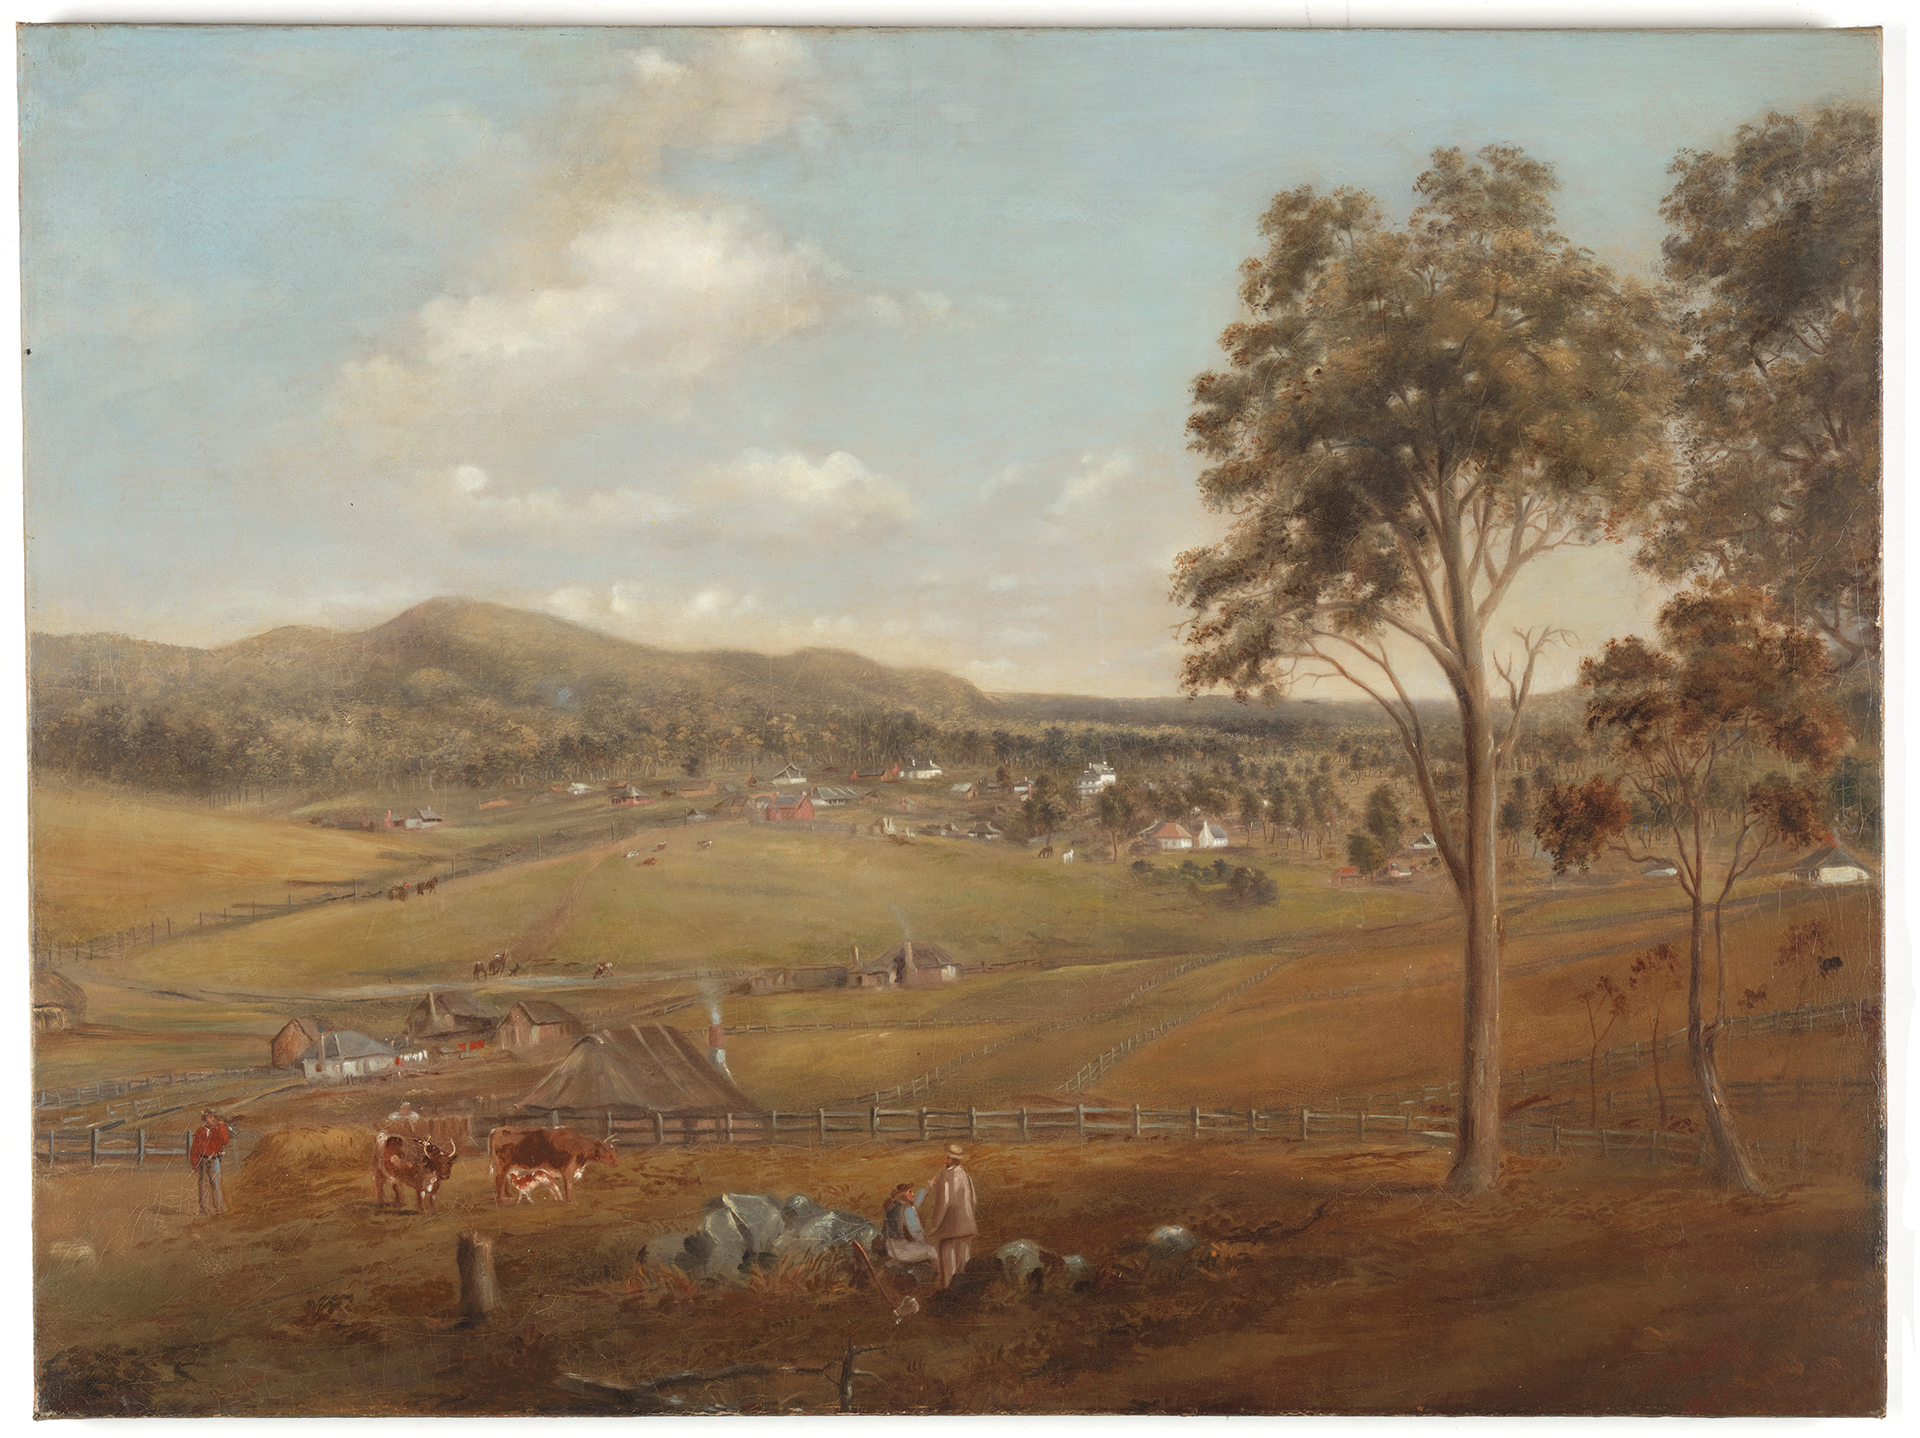 [View of Tenterfield] / Joseph Backler